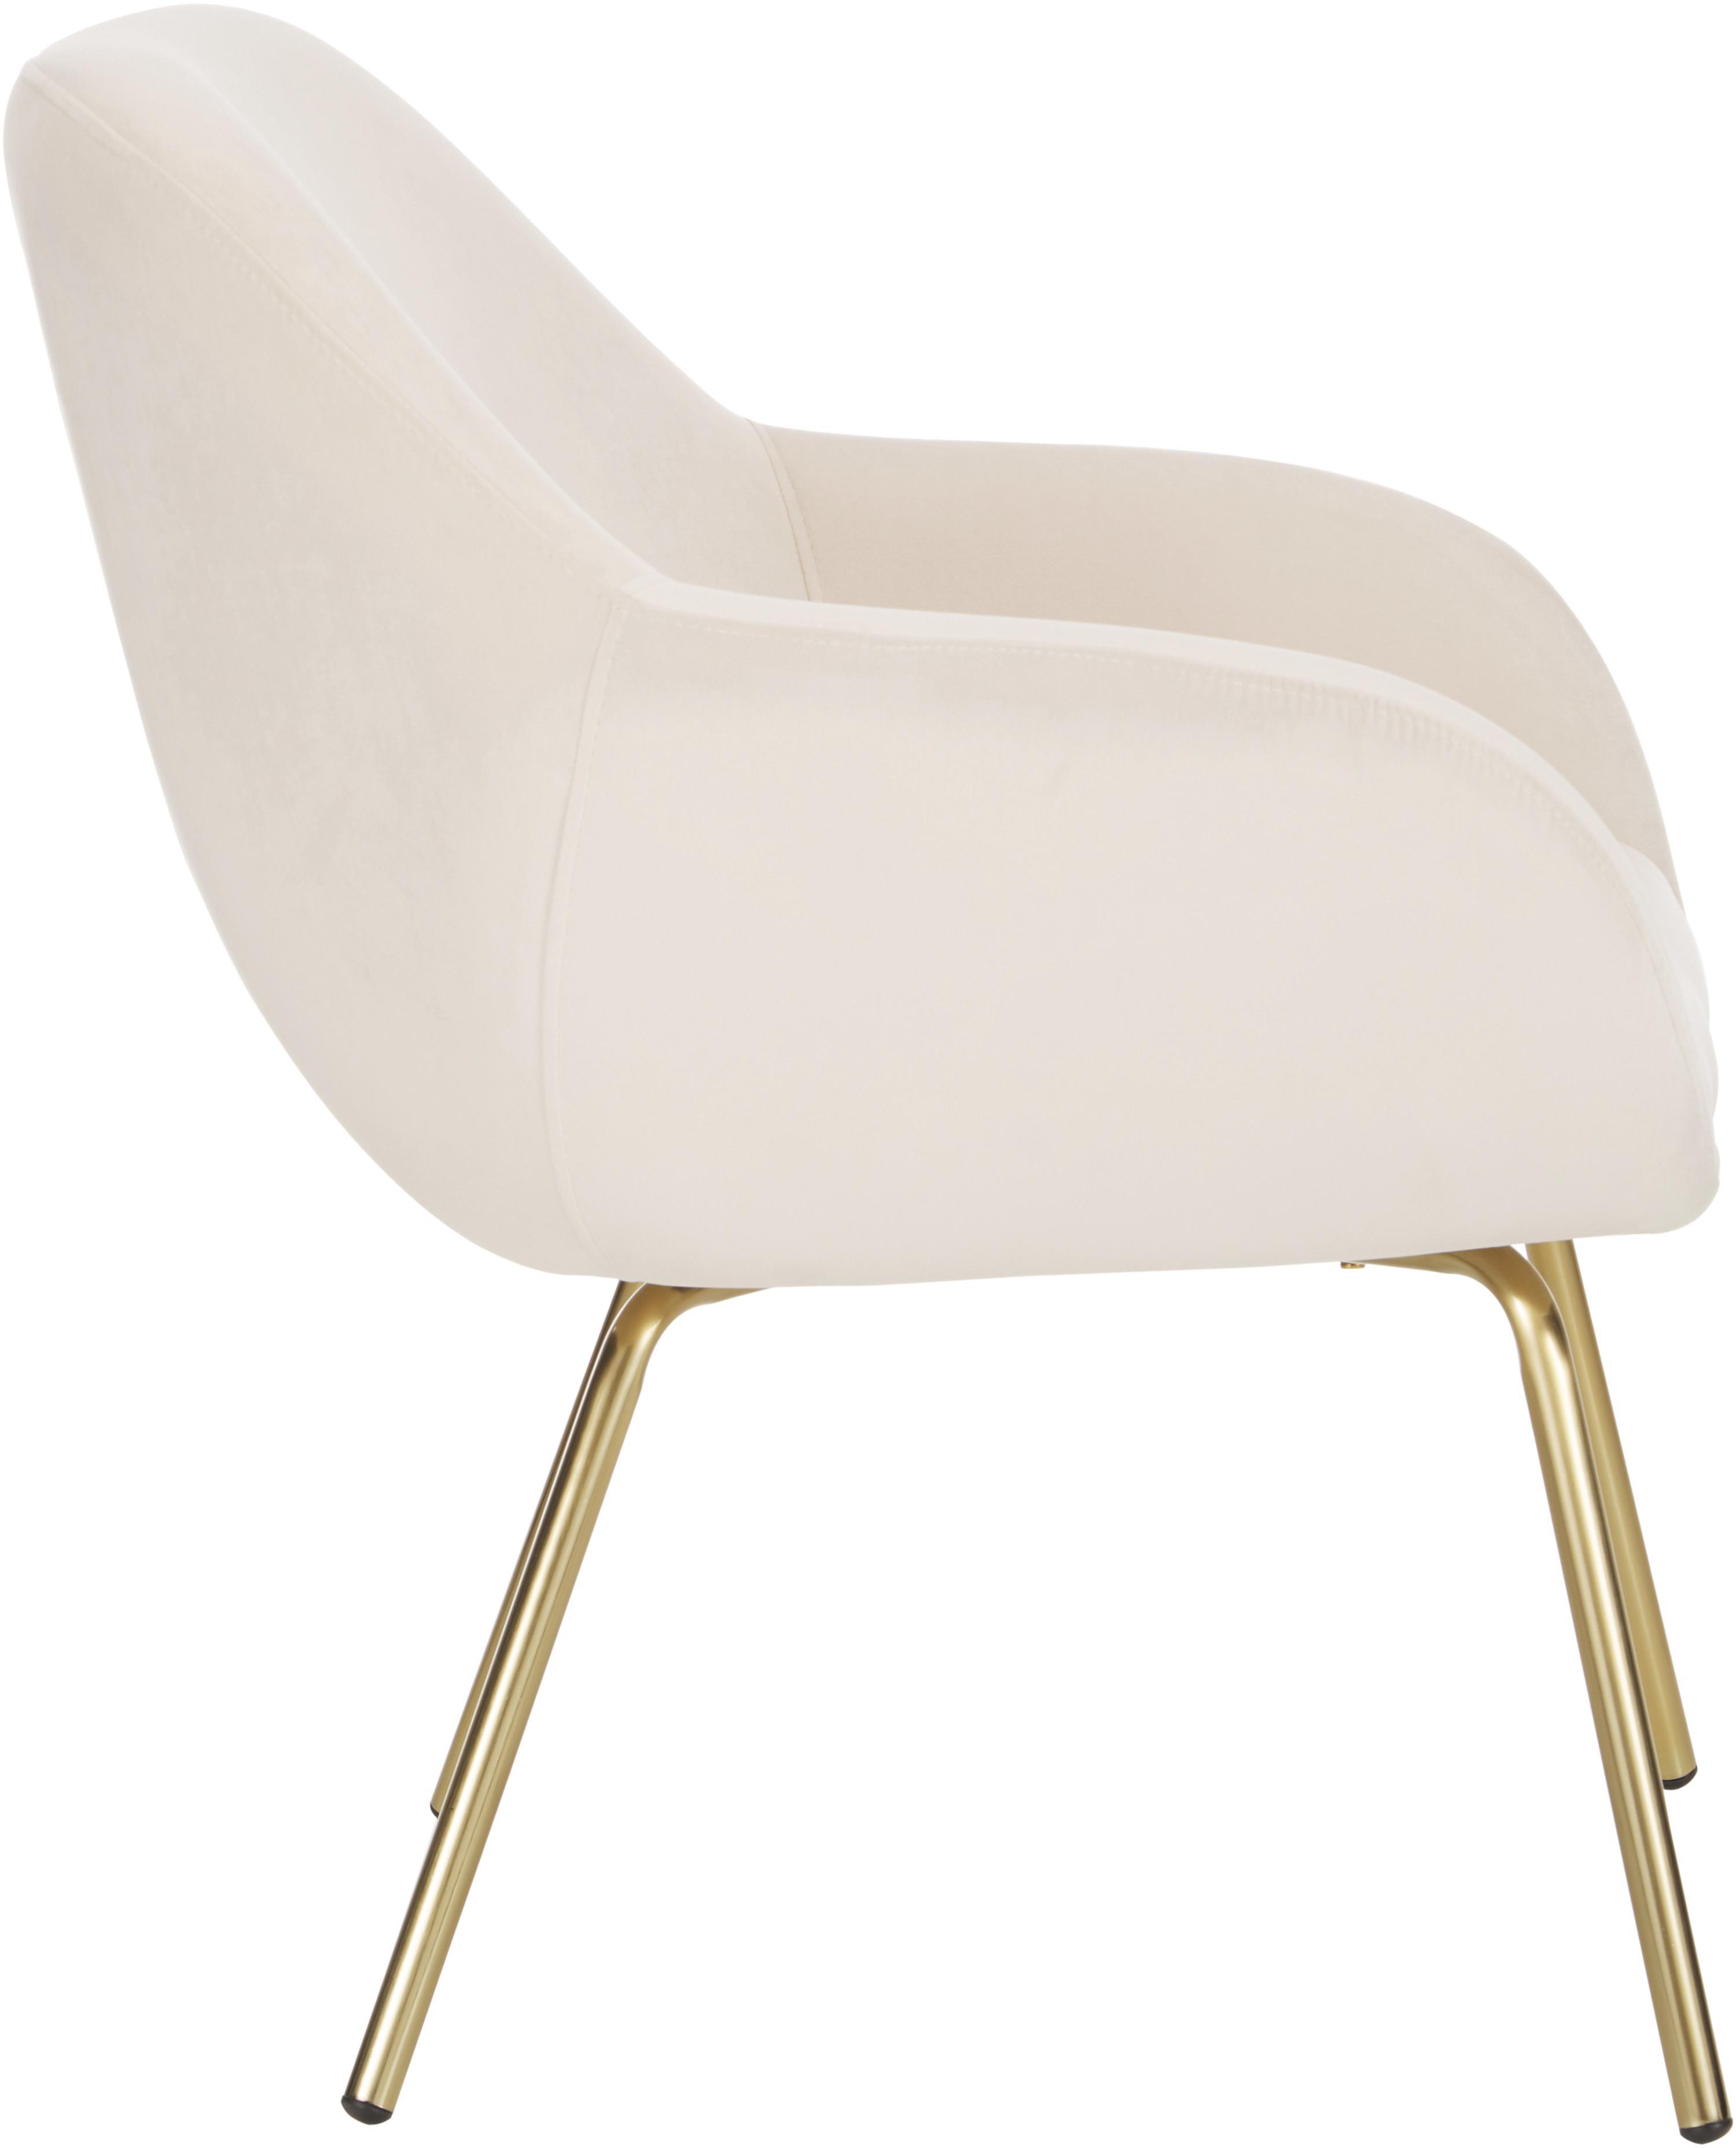 Samt-Sessel Jana, Bezug: Samt (Polyester) 25.000 S, Beine: Metall, lackiert, Samt Cremeweiß, B 72 x T 68 cm